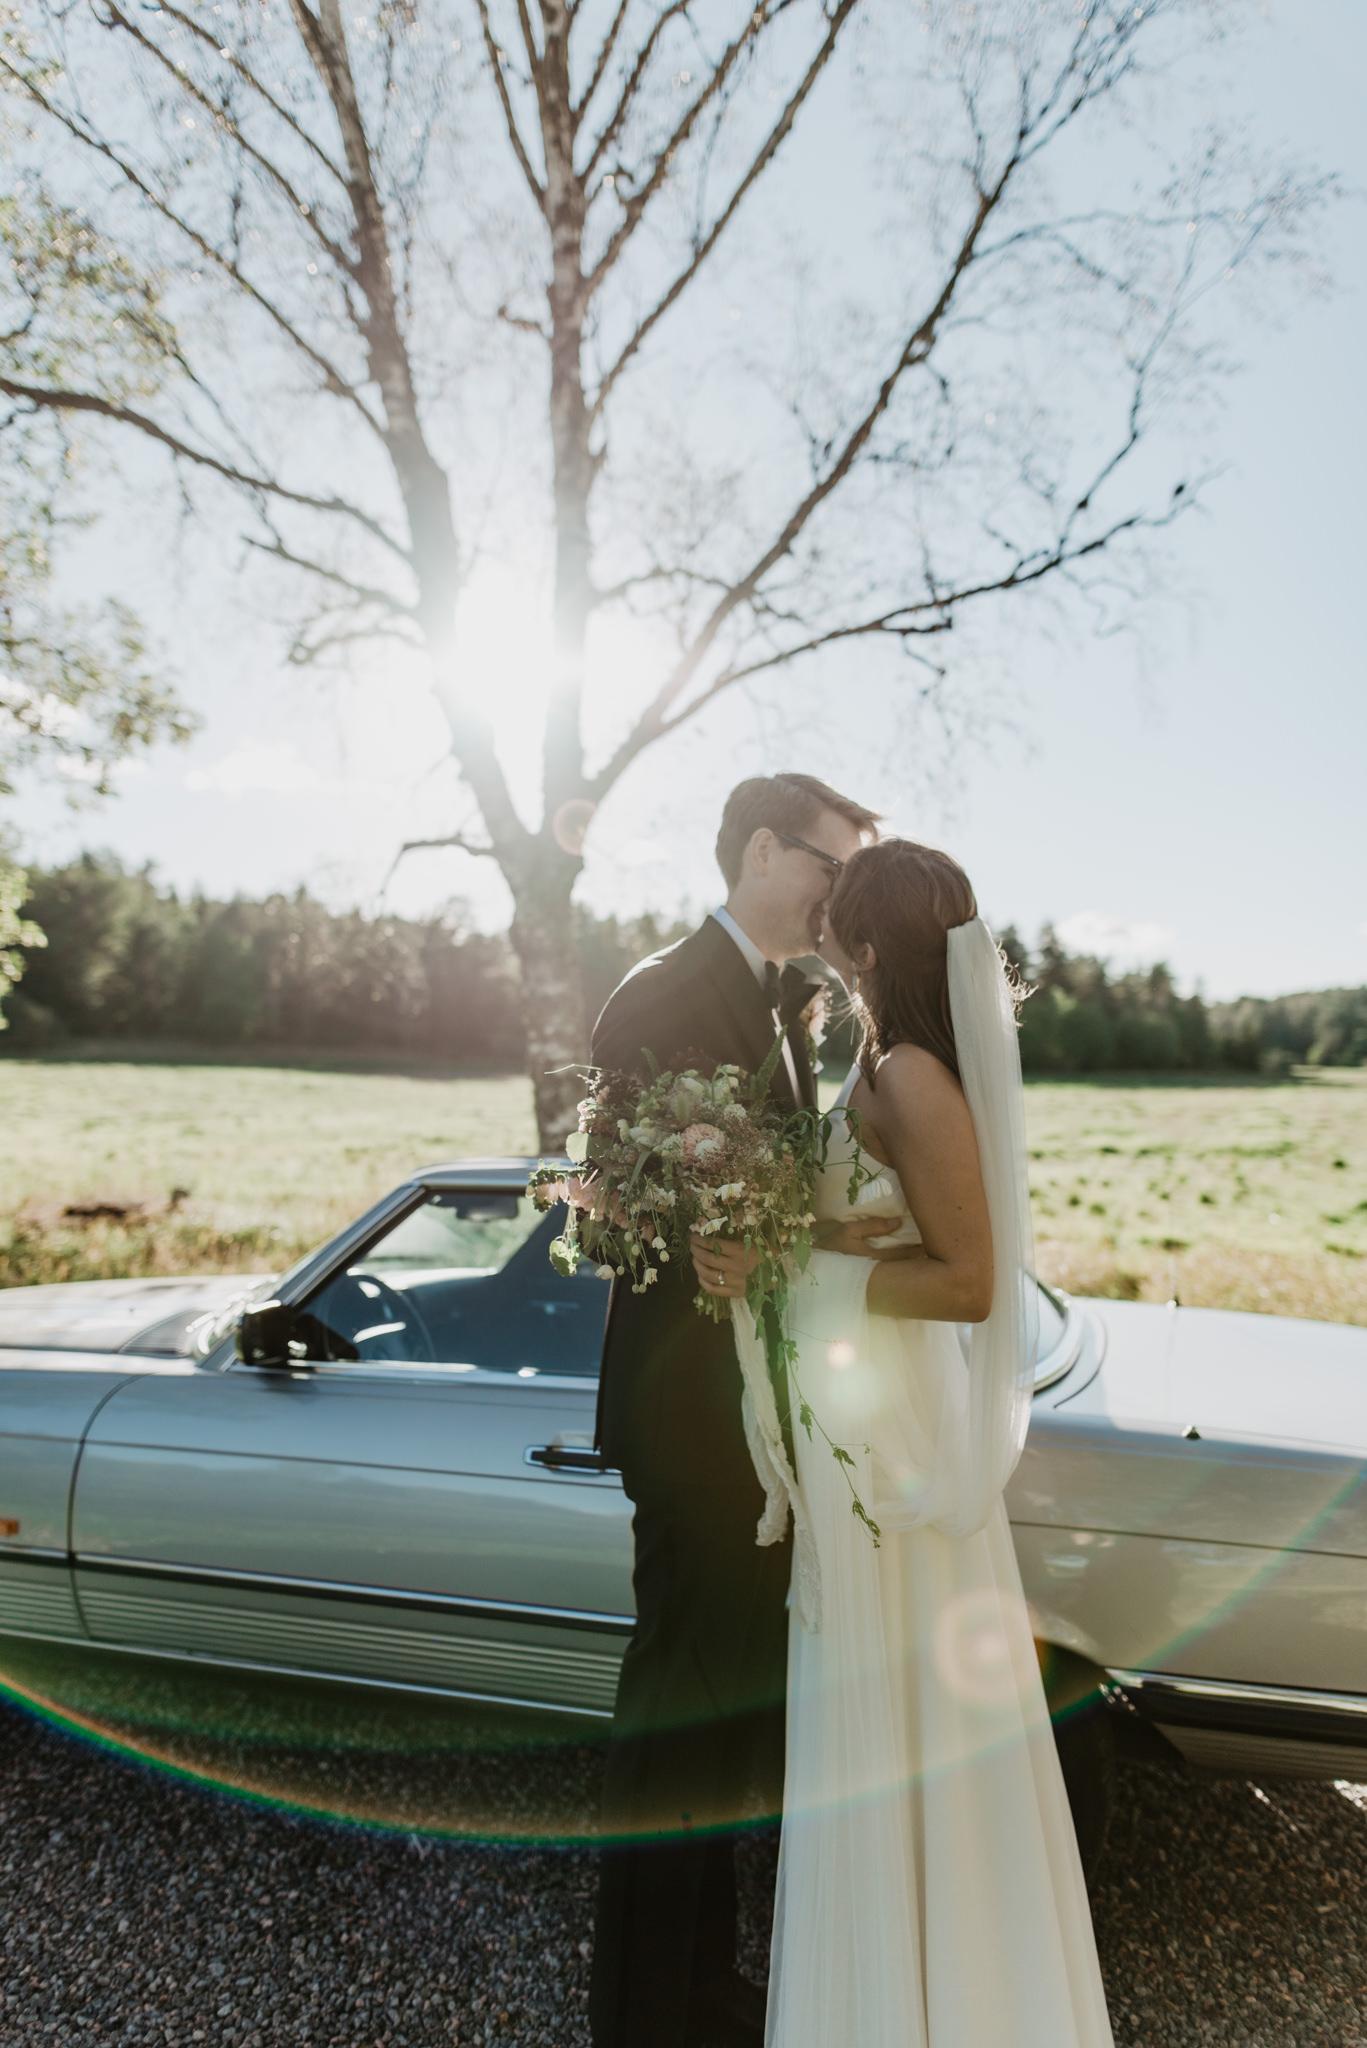 FEATURED STORY - Effortlessly Chic Archipelago Wedding